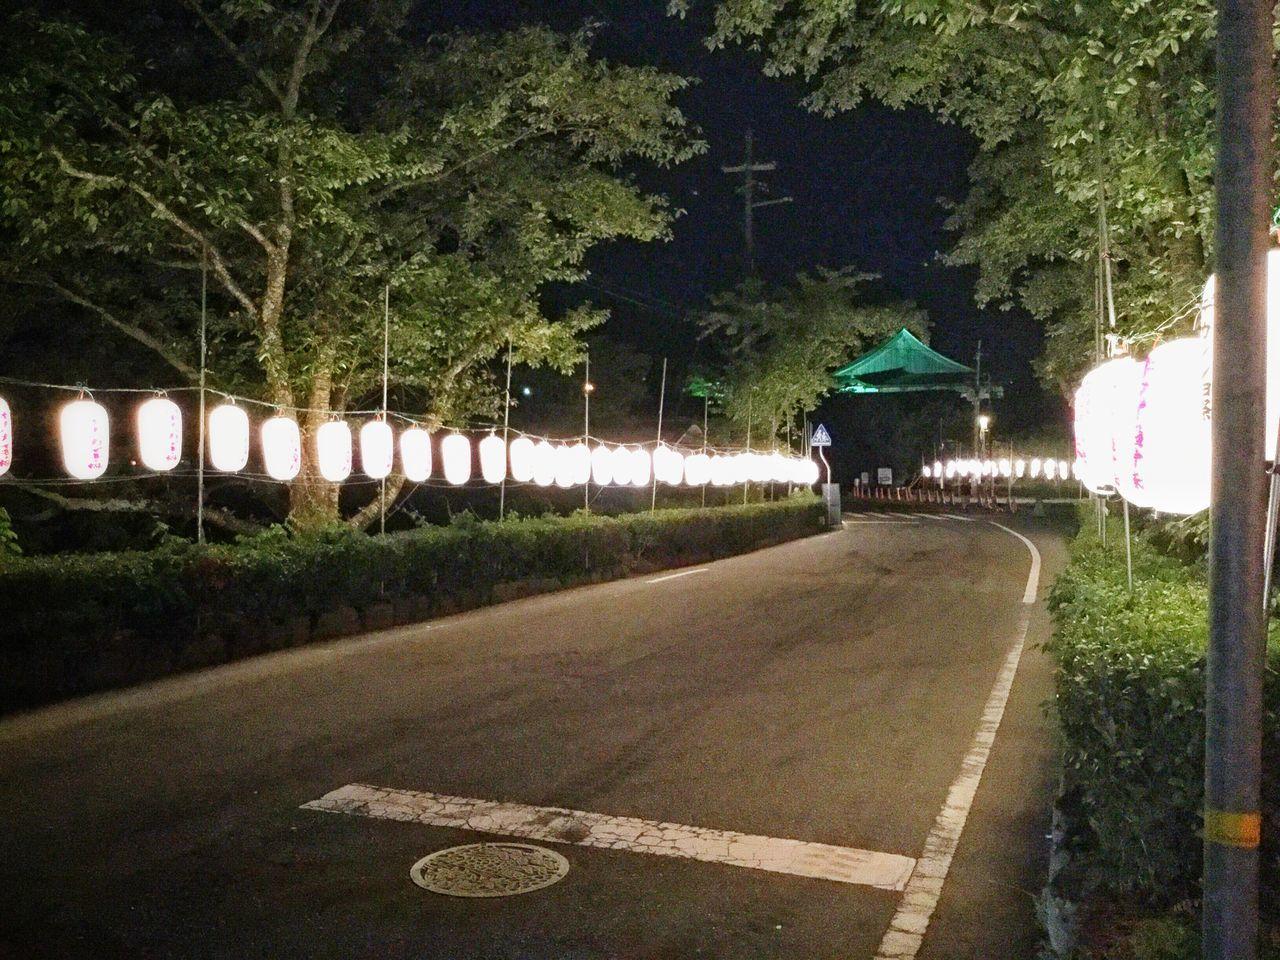 Summerfestival Festival Sammer Omatsuri Obon Lantern Japan